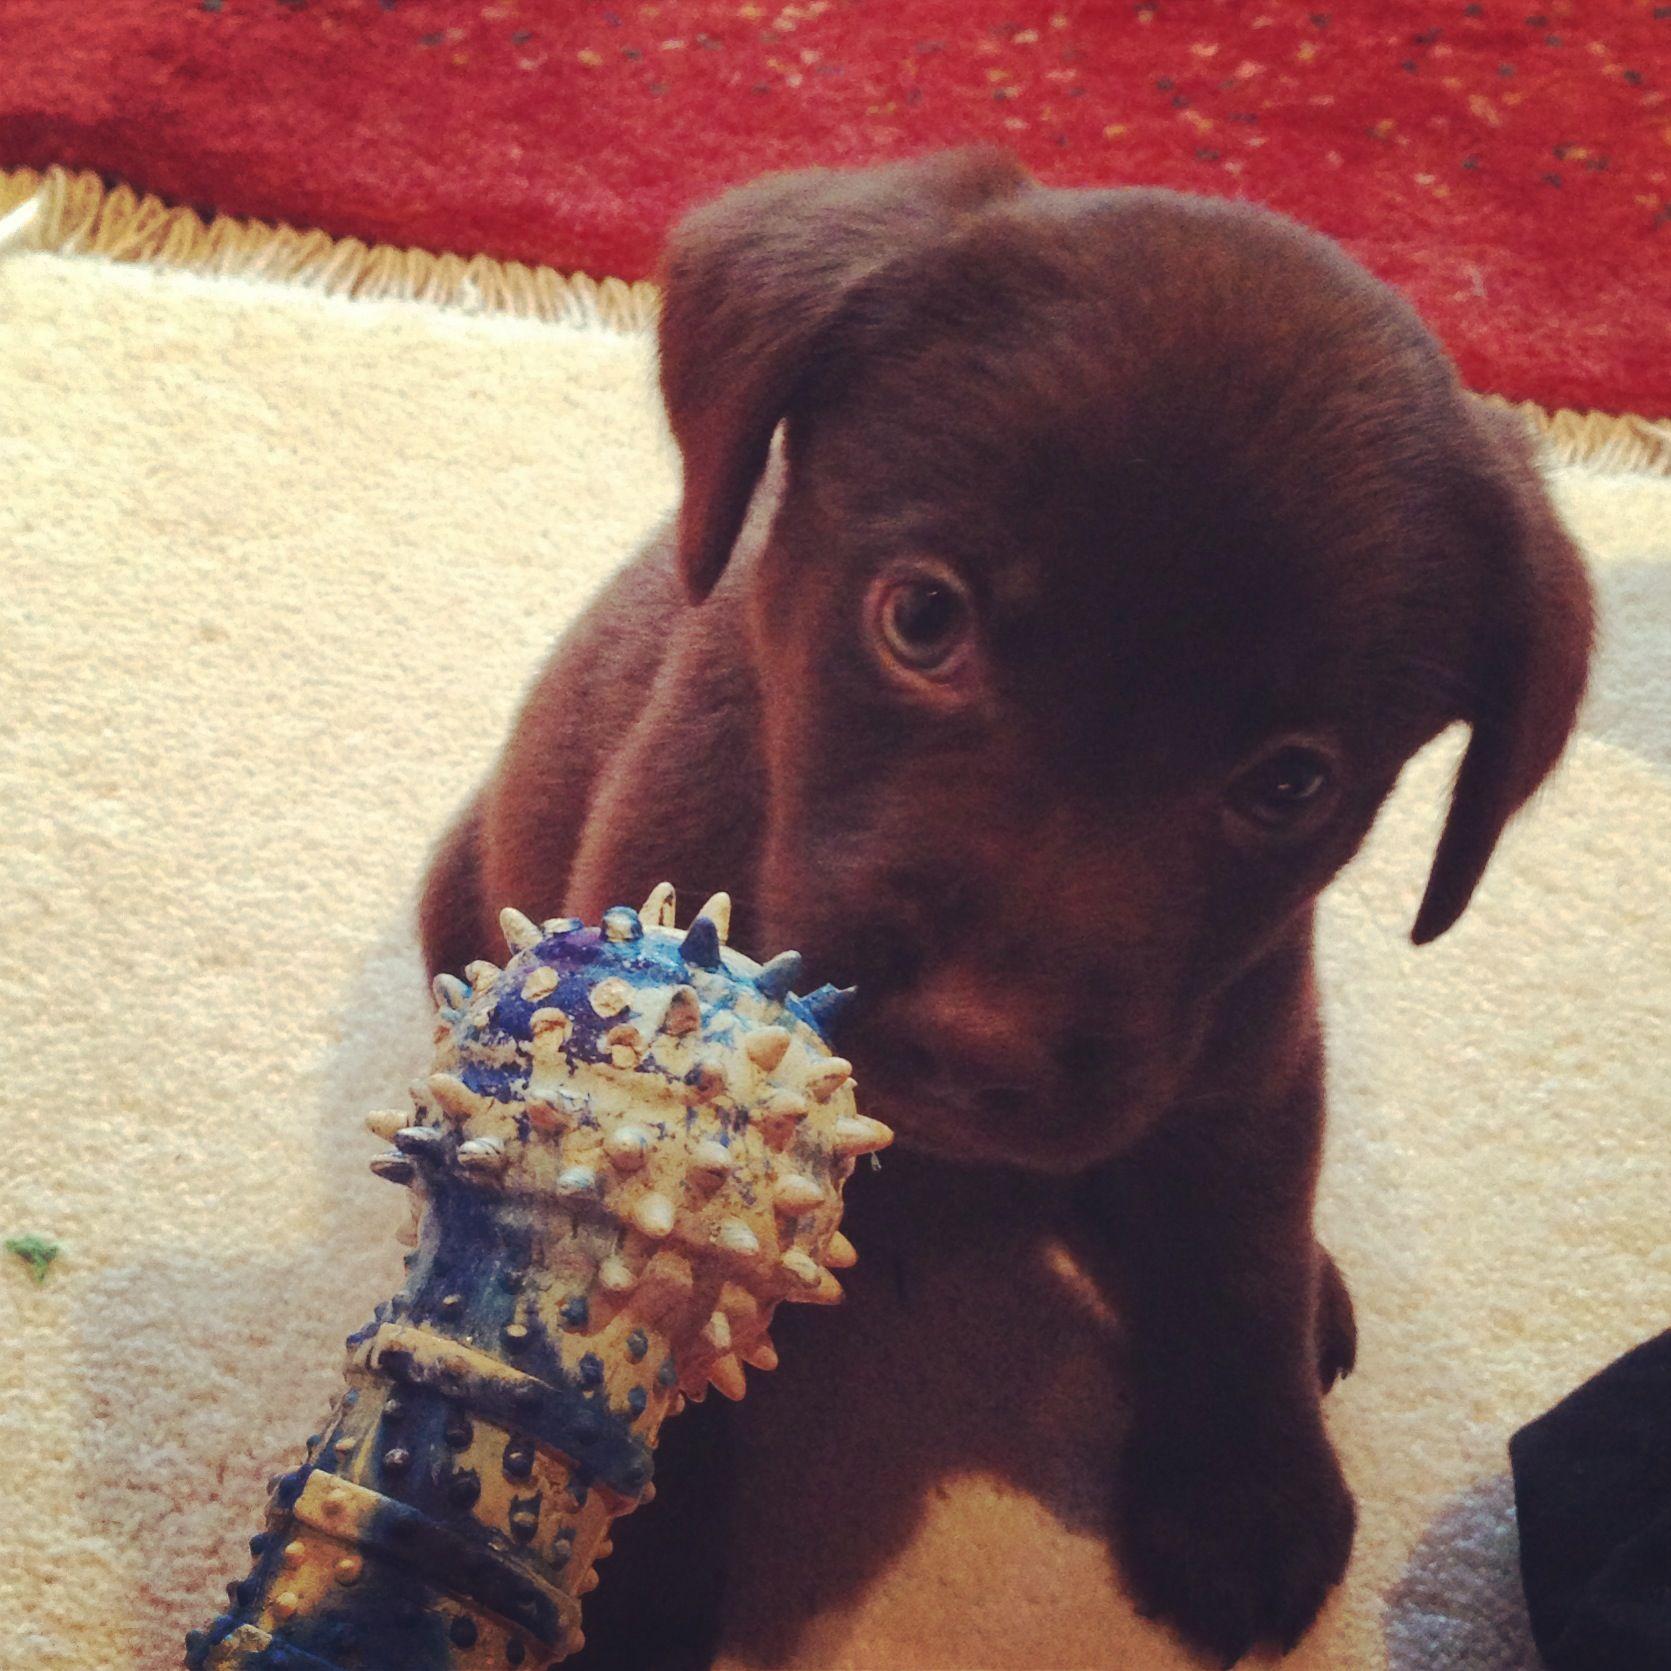 Morning chew toy! So fun!  Puppy - labrador - chocolate labrador - chocolate lab - dog - petersfield - pet - play - animal - love.